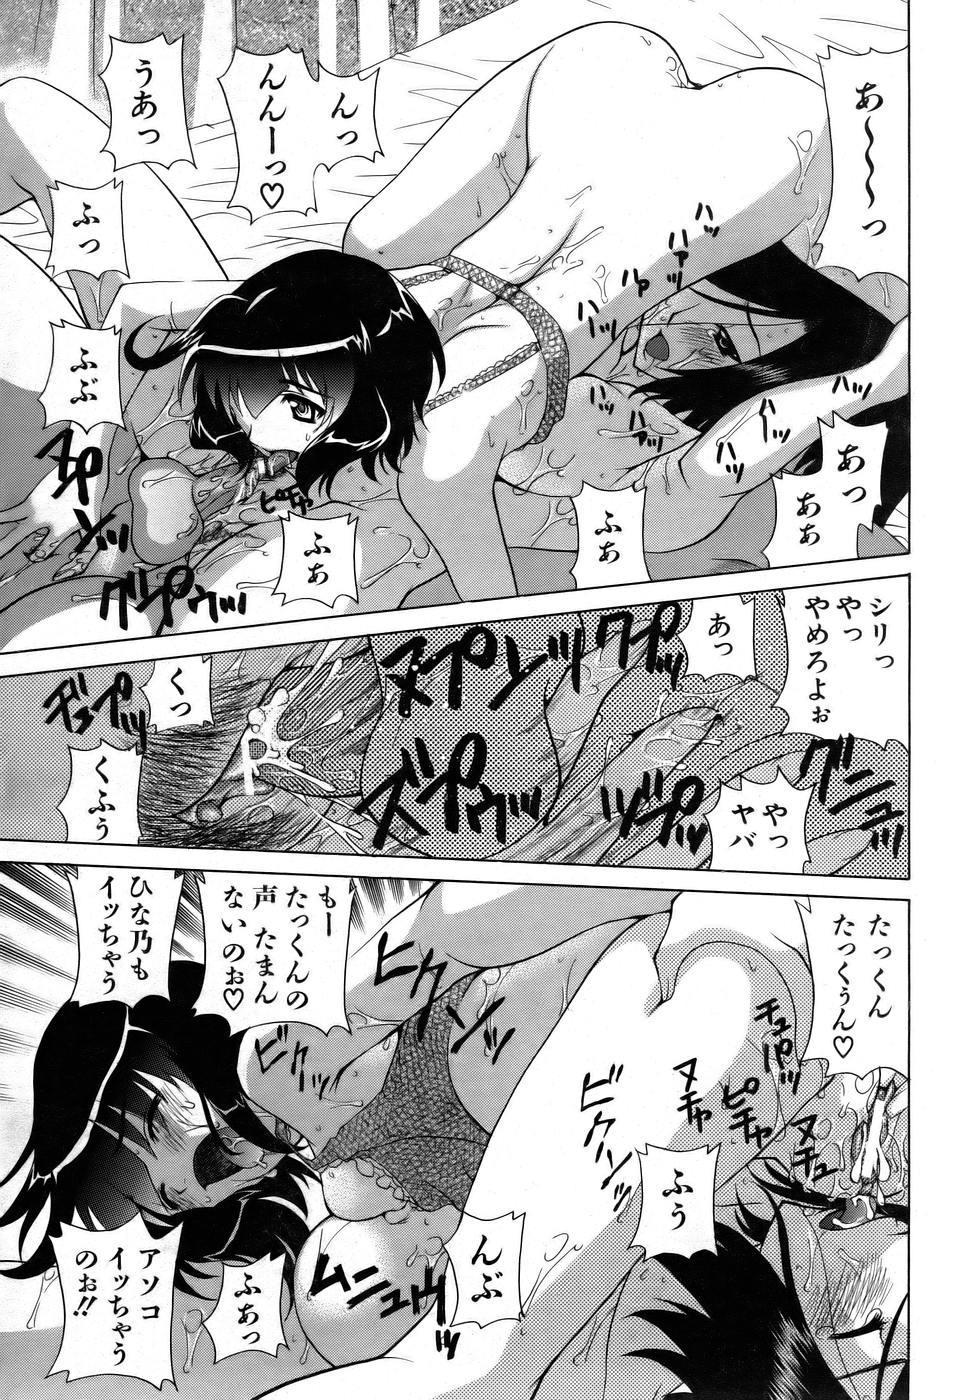 COMIC AUN 2005-12 Vol. 115 330